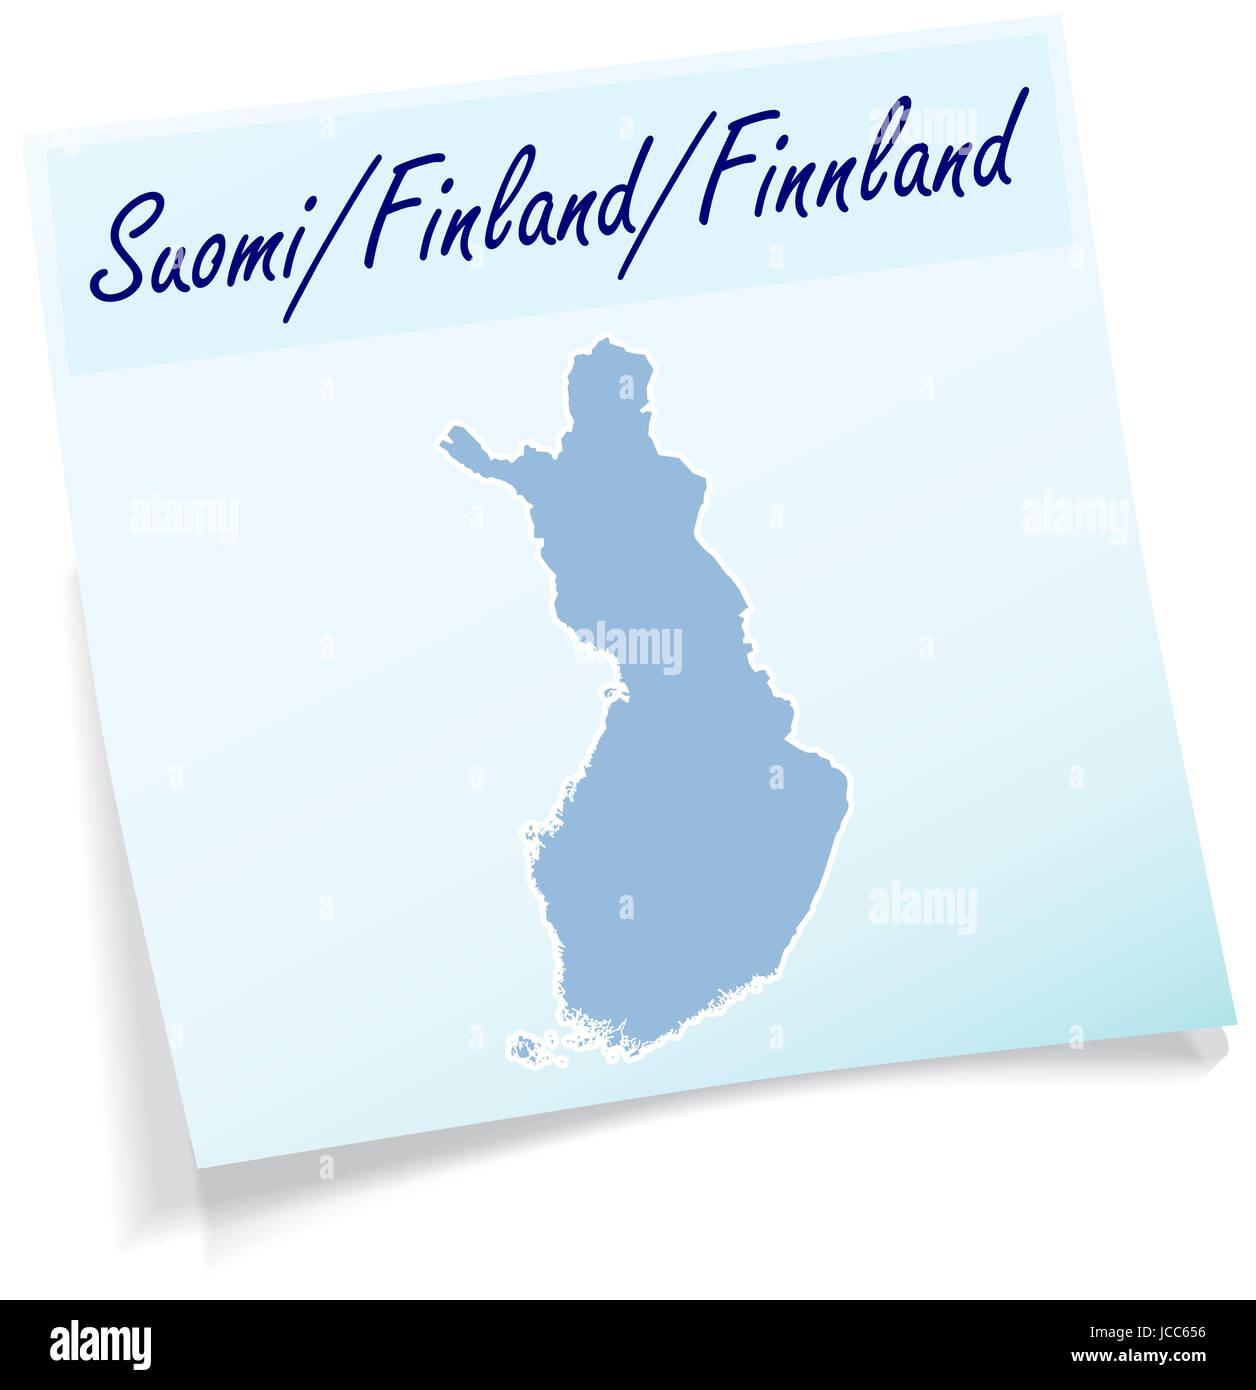 Finnland als Notizzettel in Blau - Stock Image